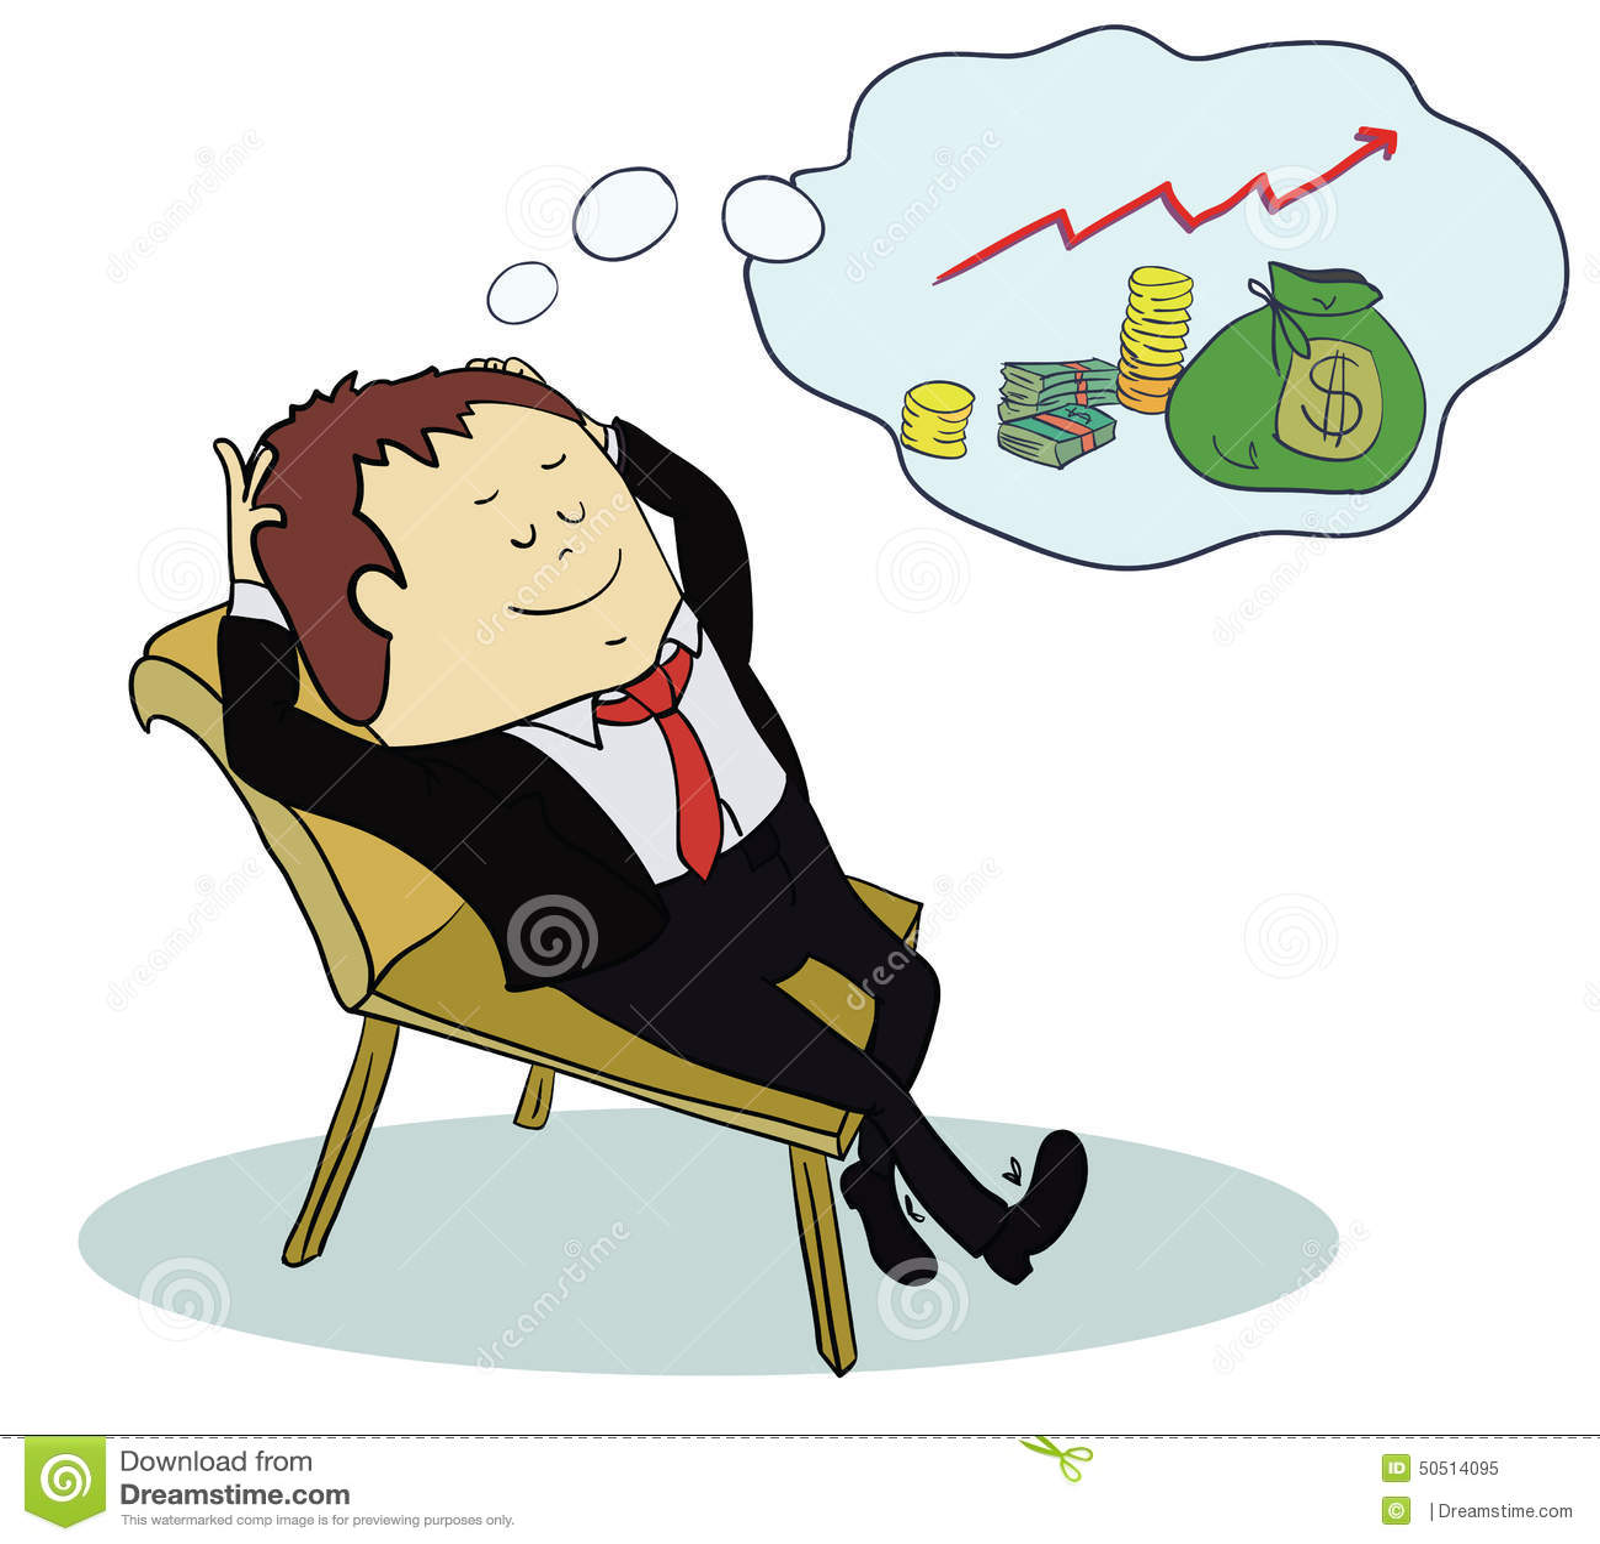 Man Dream About Money Concept Cartoon Stock Vector Image